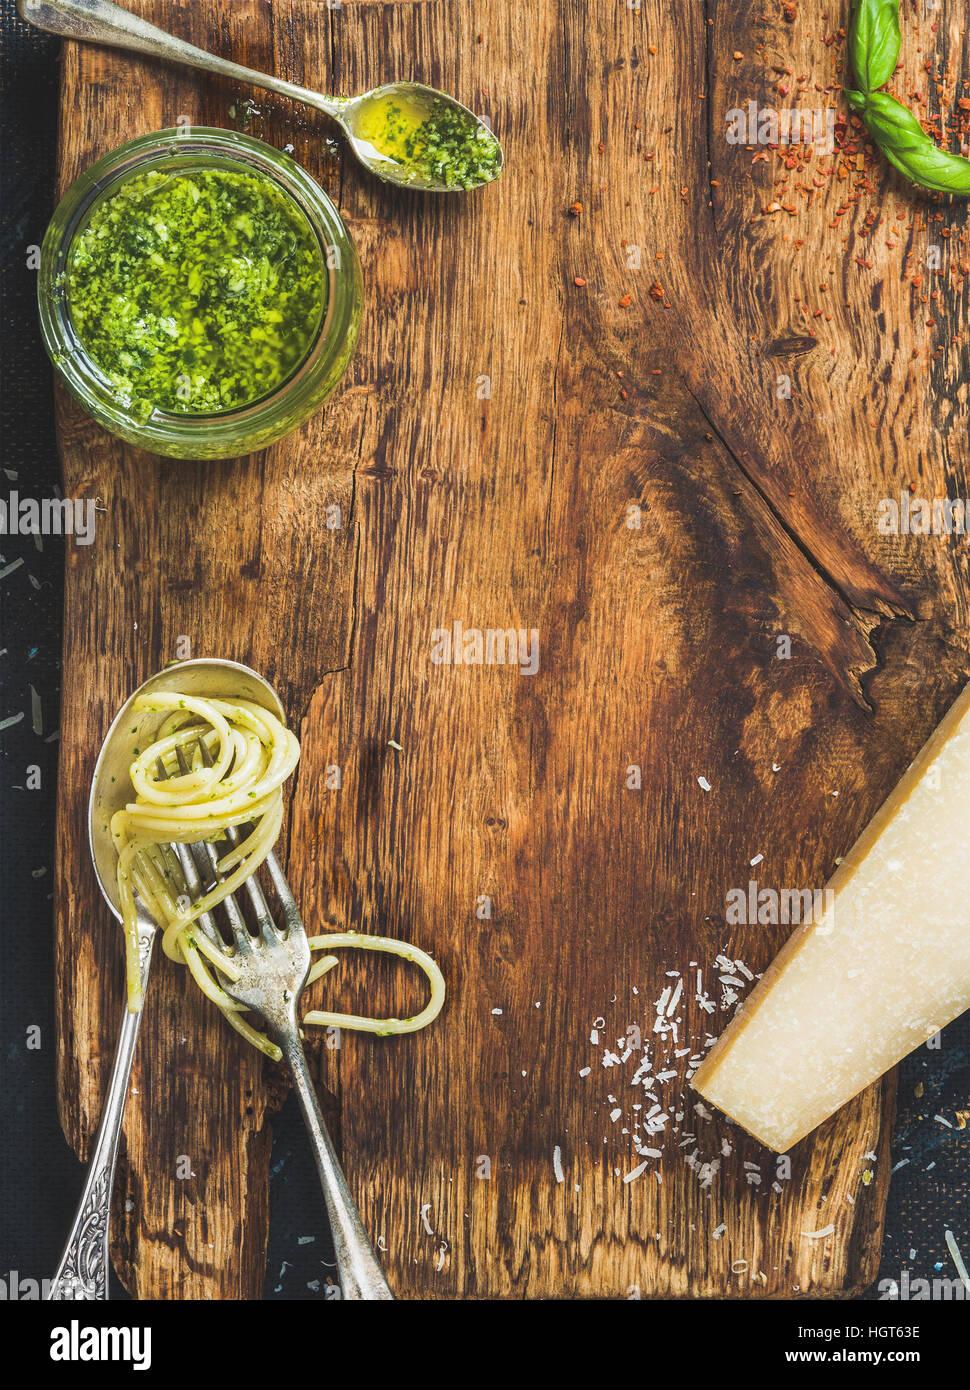 Italienische Küche kochen Hintergrund, rustikalen Holzbrett Textur Stockbild